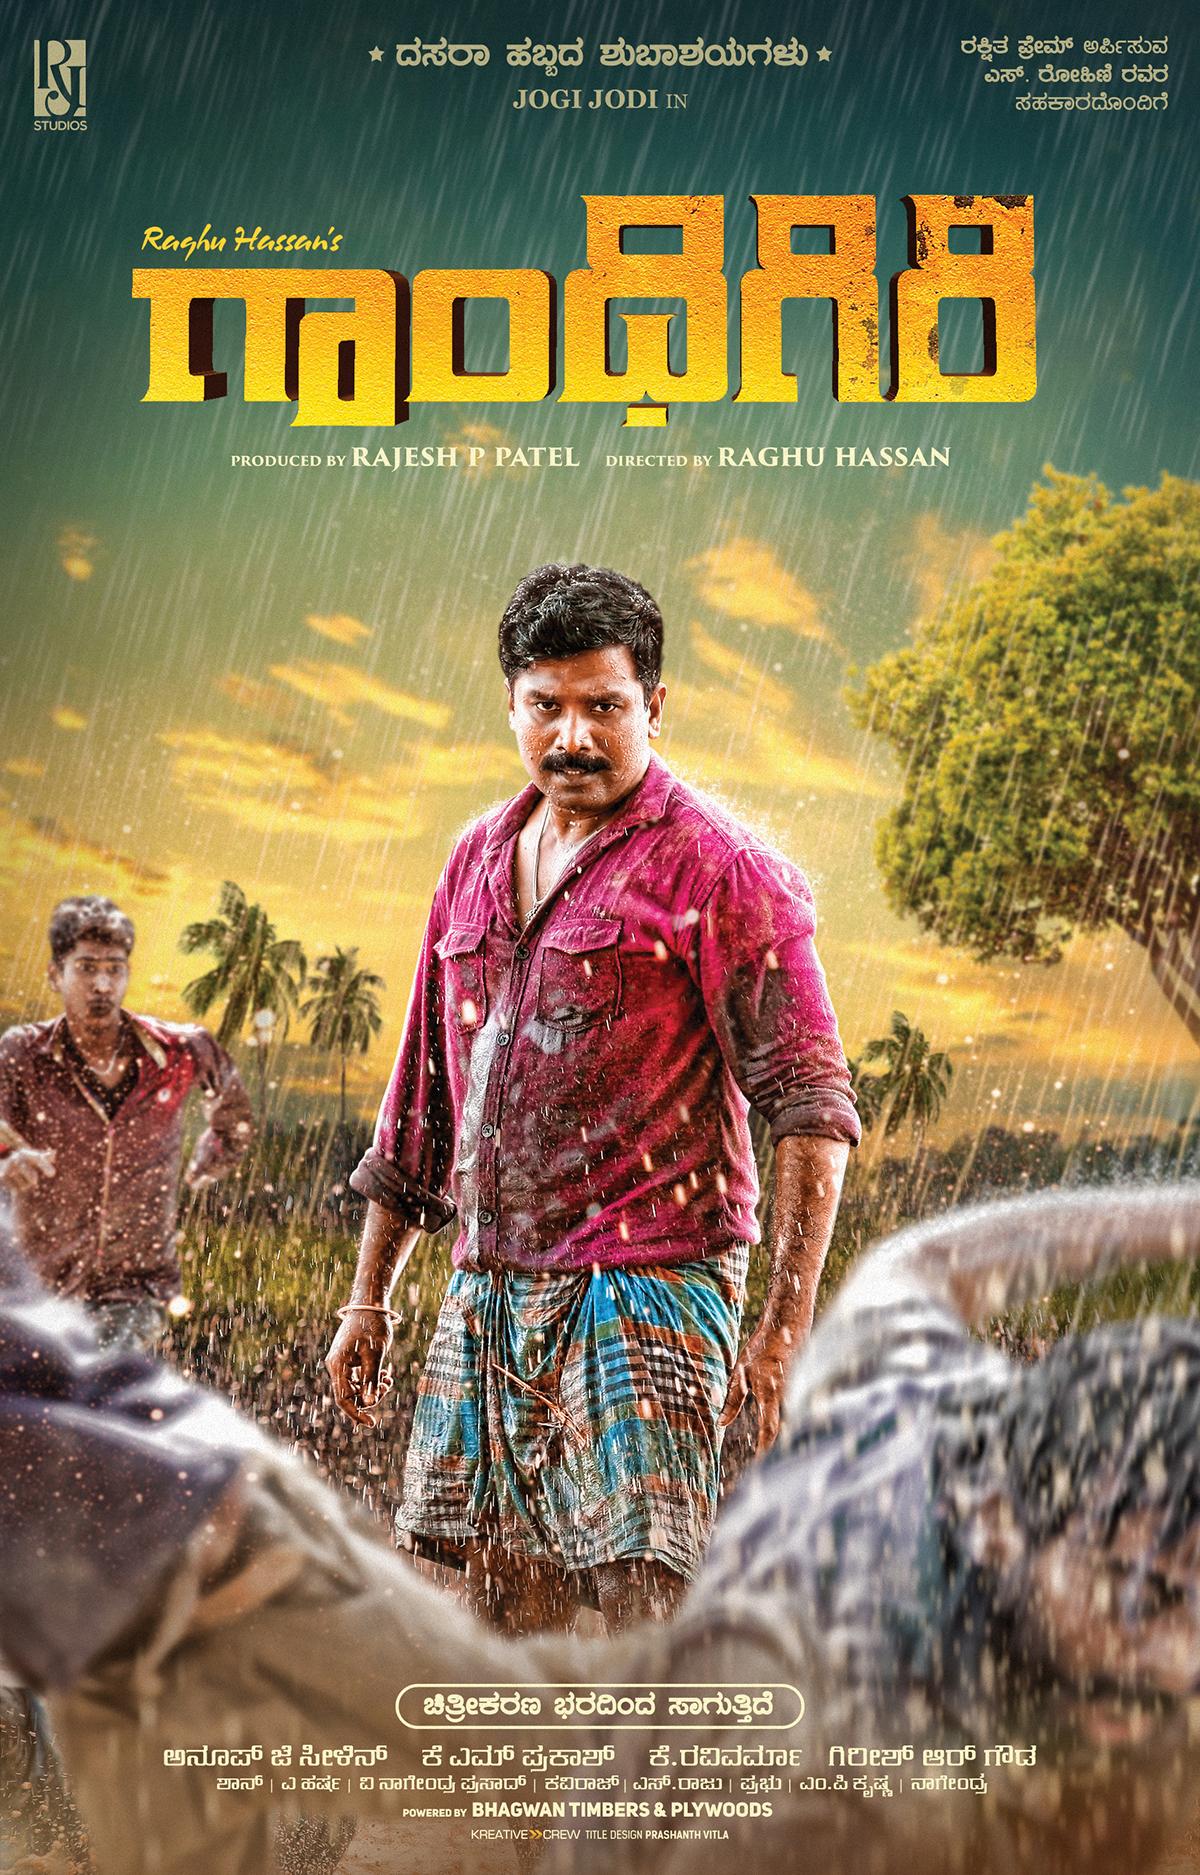 Gandhigiri Kannada Movie Official Poster On Behance